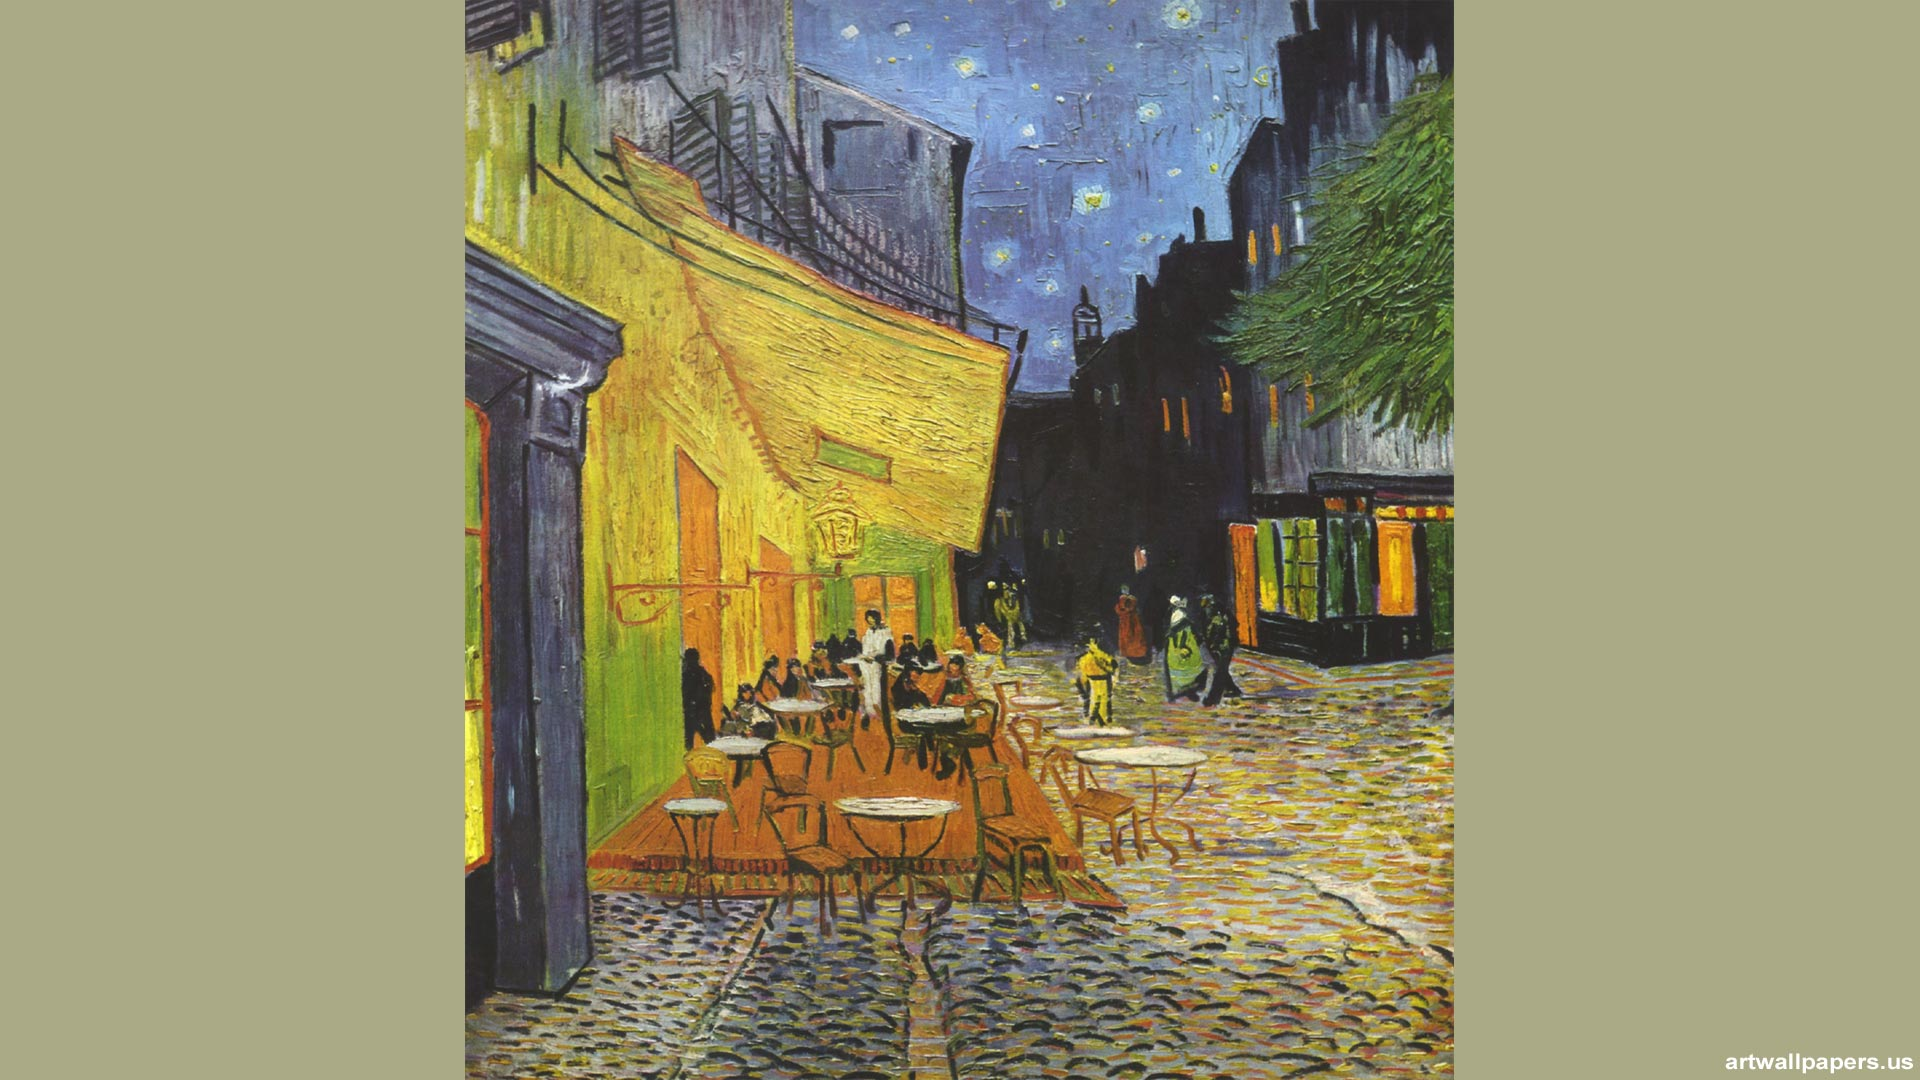 Vincent van Gogh Wallpaper Vincent van Gogh Starry Night Paintings 1920x1080